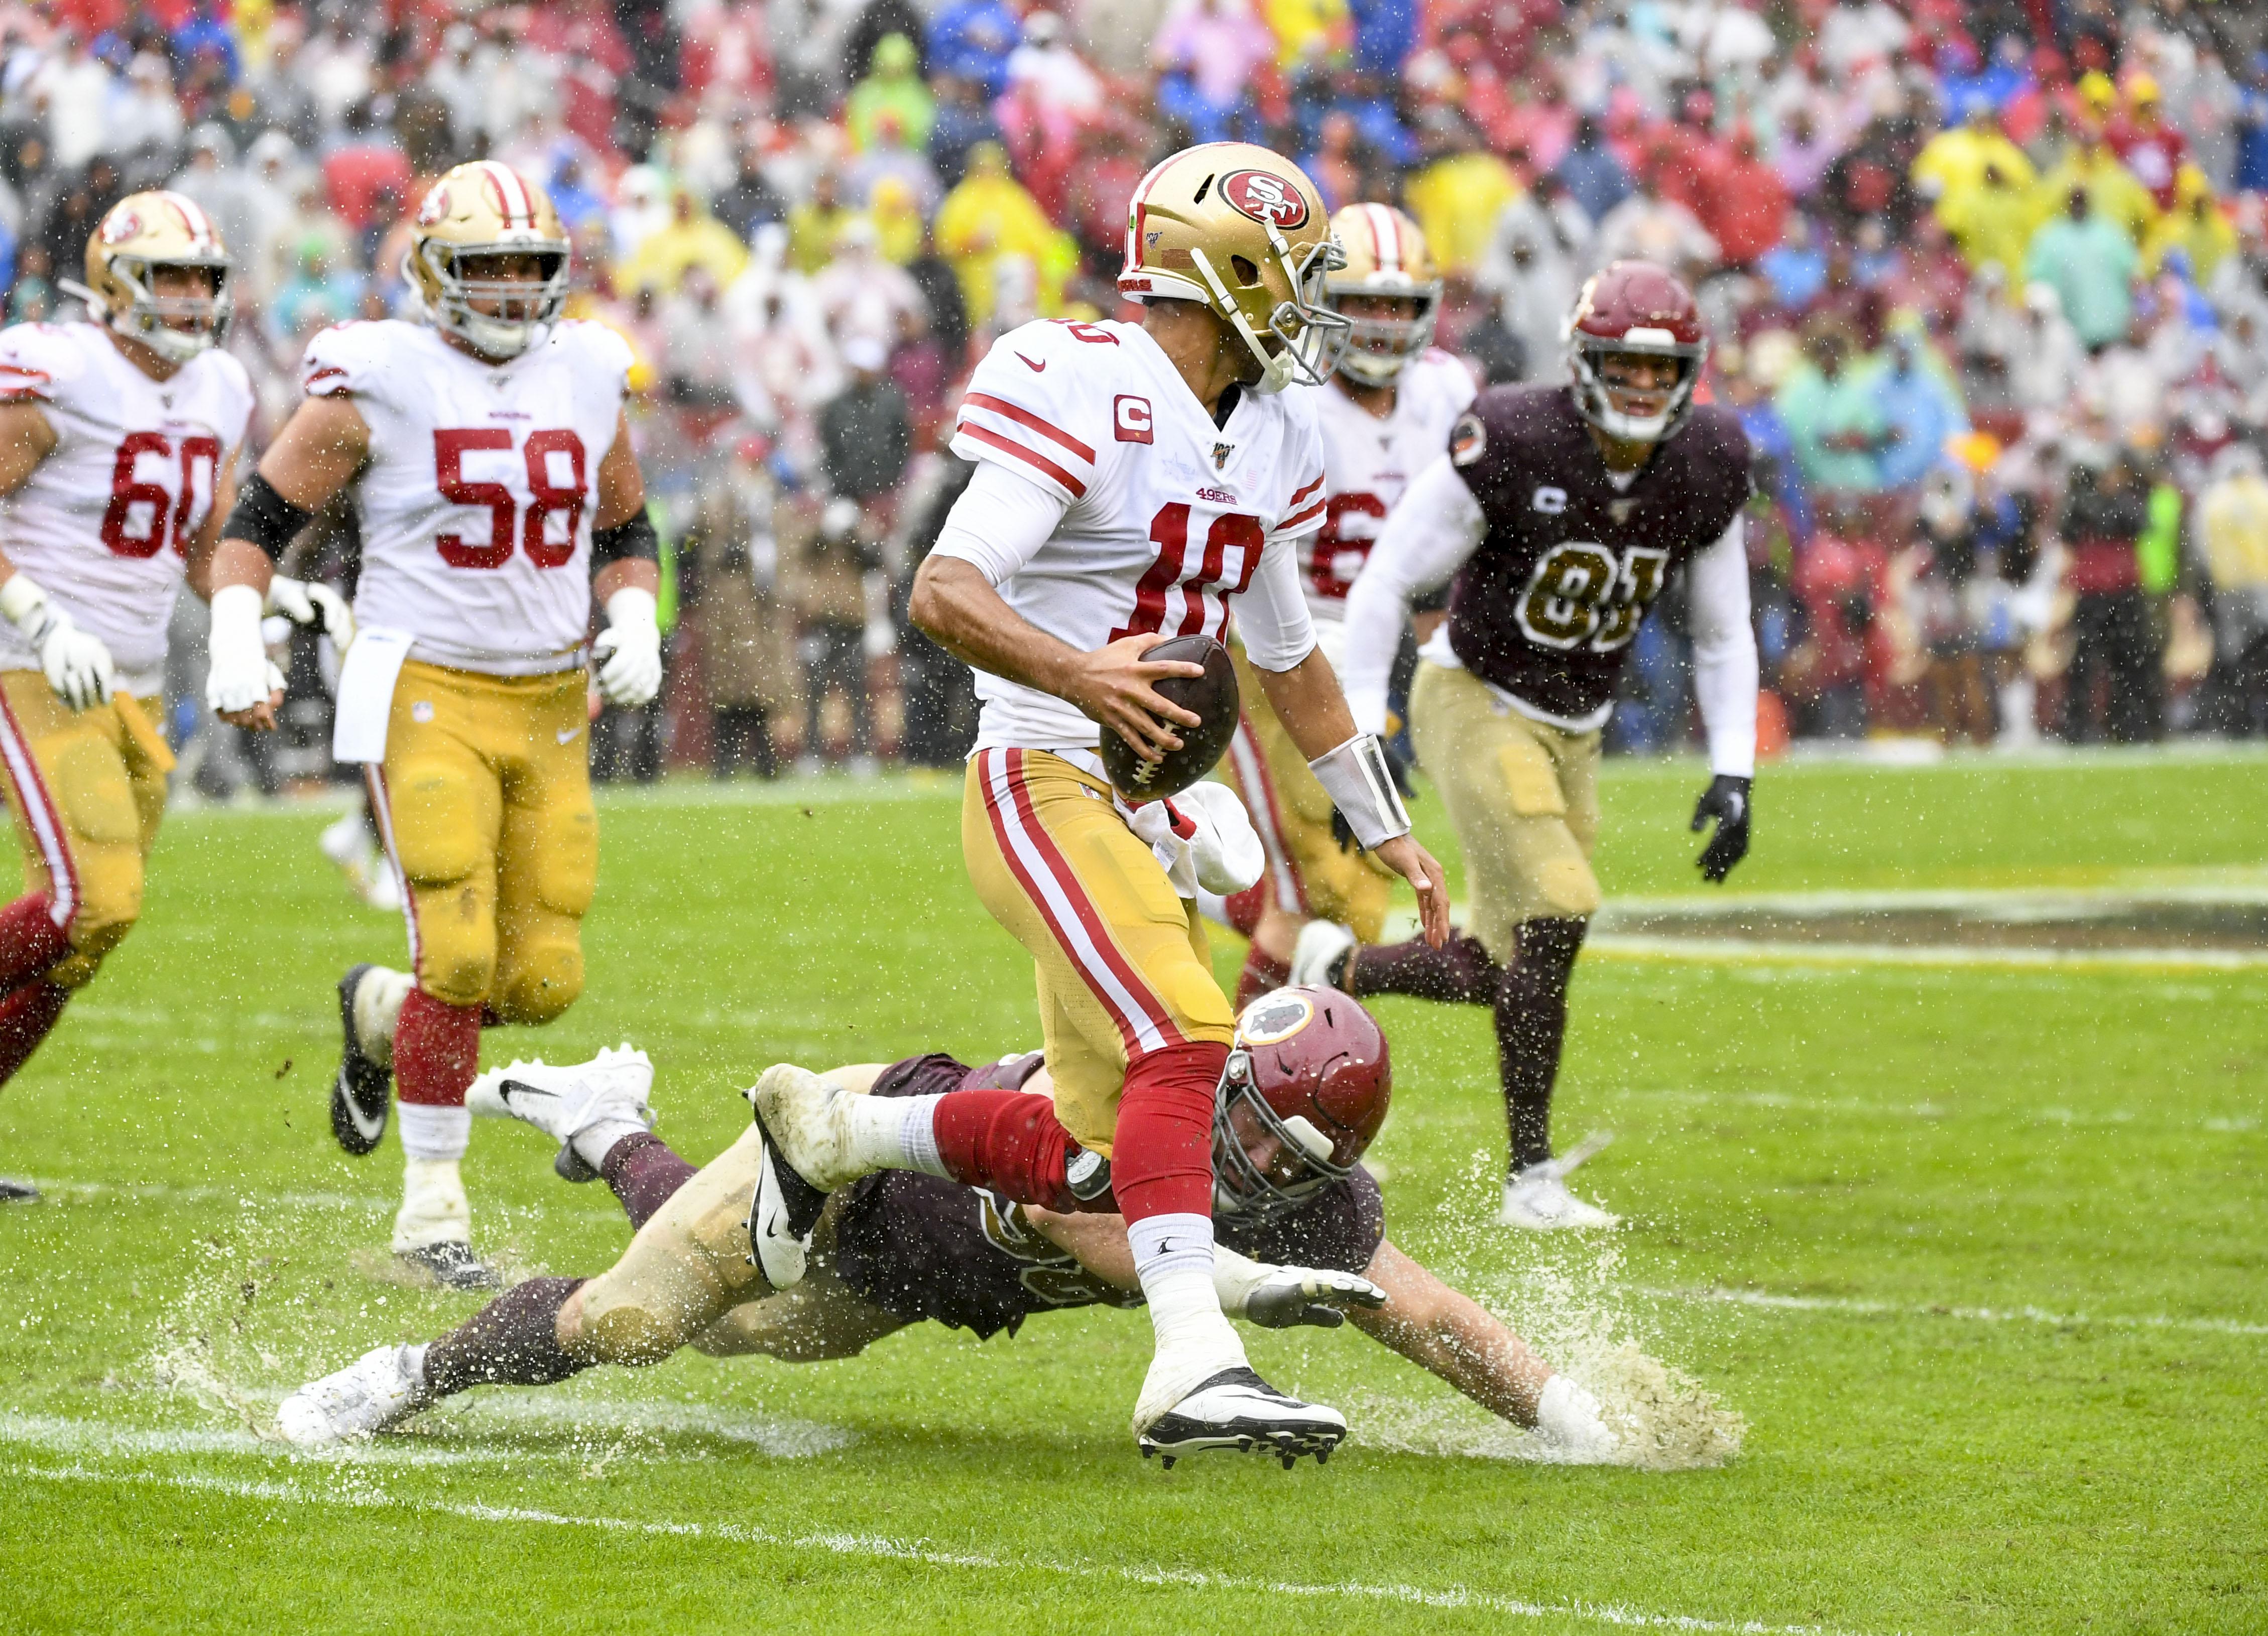 NFL-San Francisco 49ers at Washington Redskins